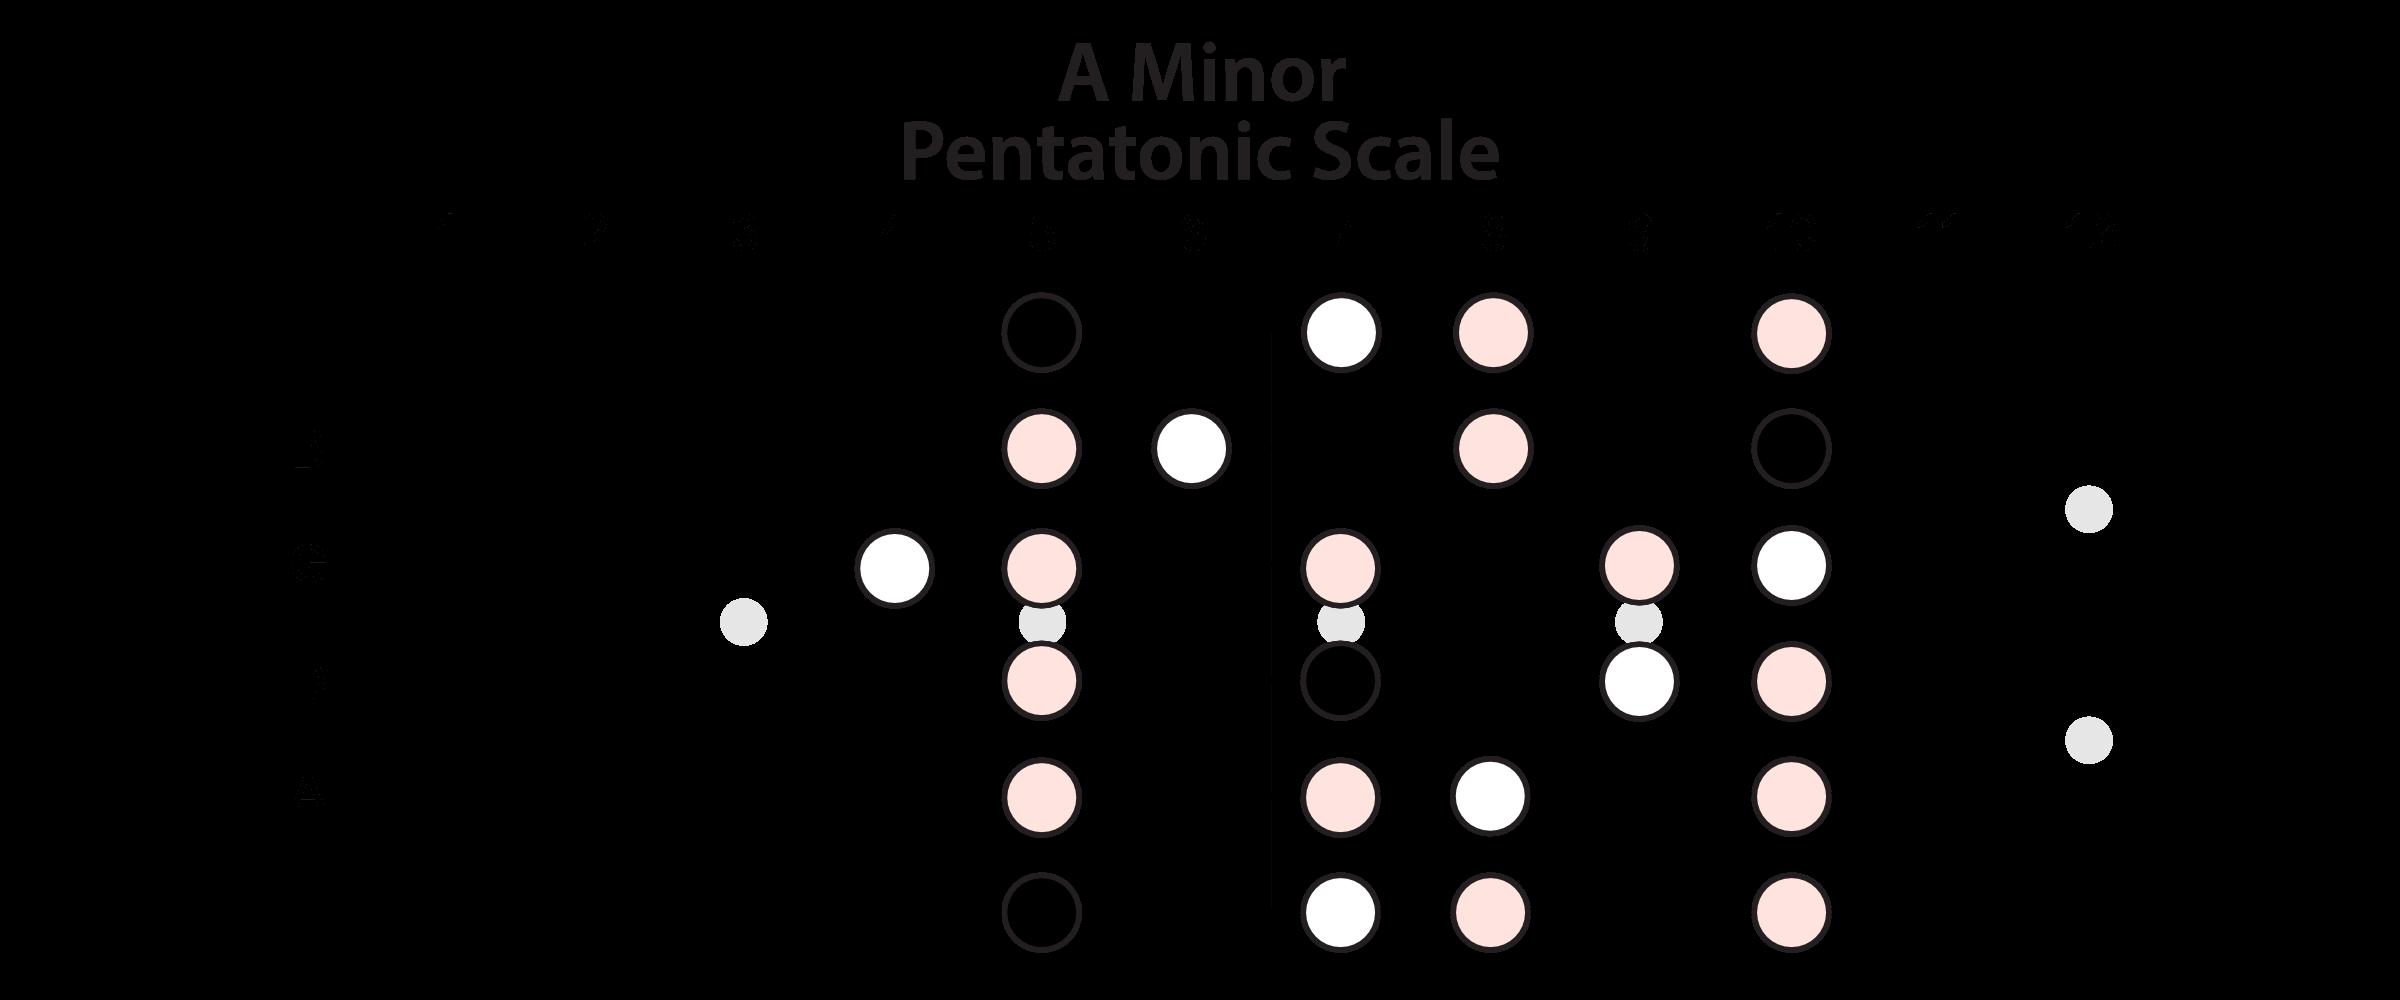 A Minor Pentatonic Horizontal View